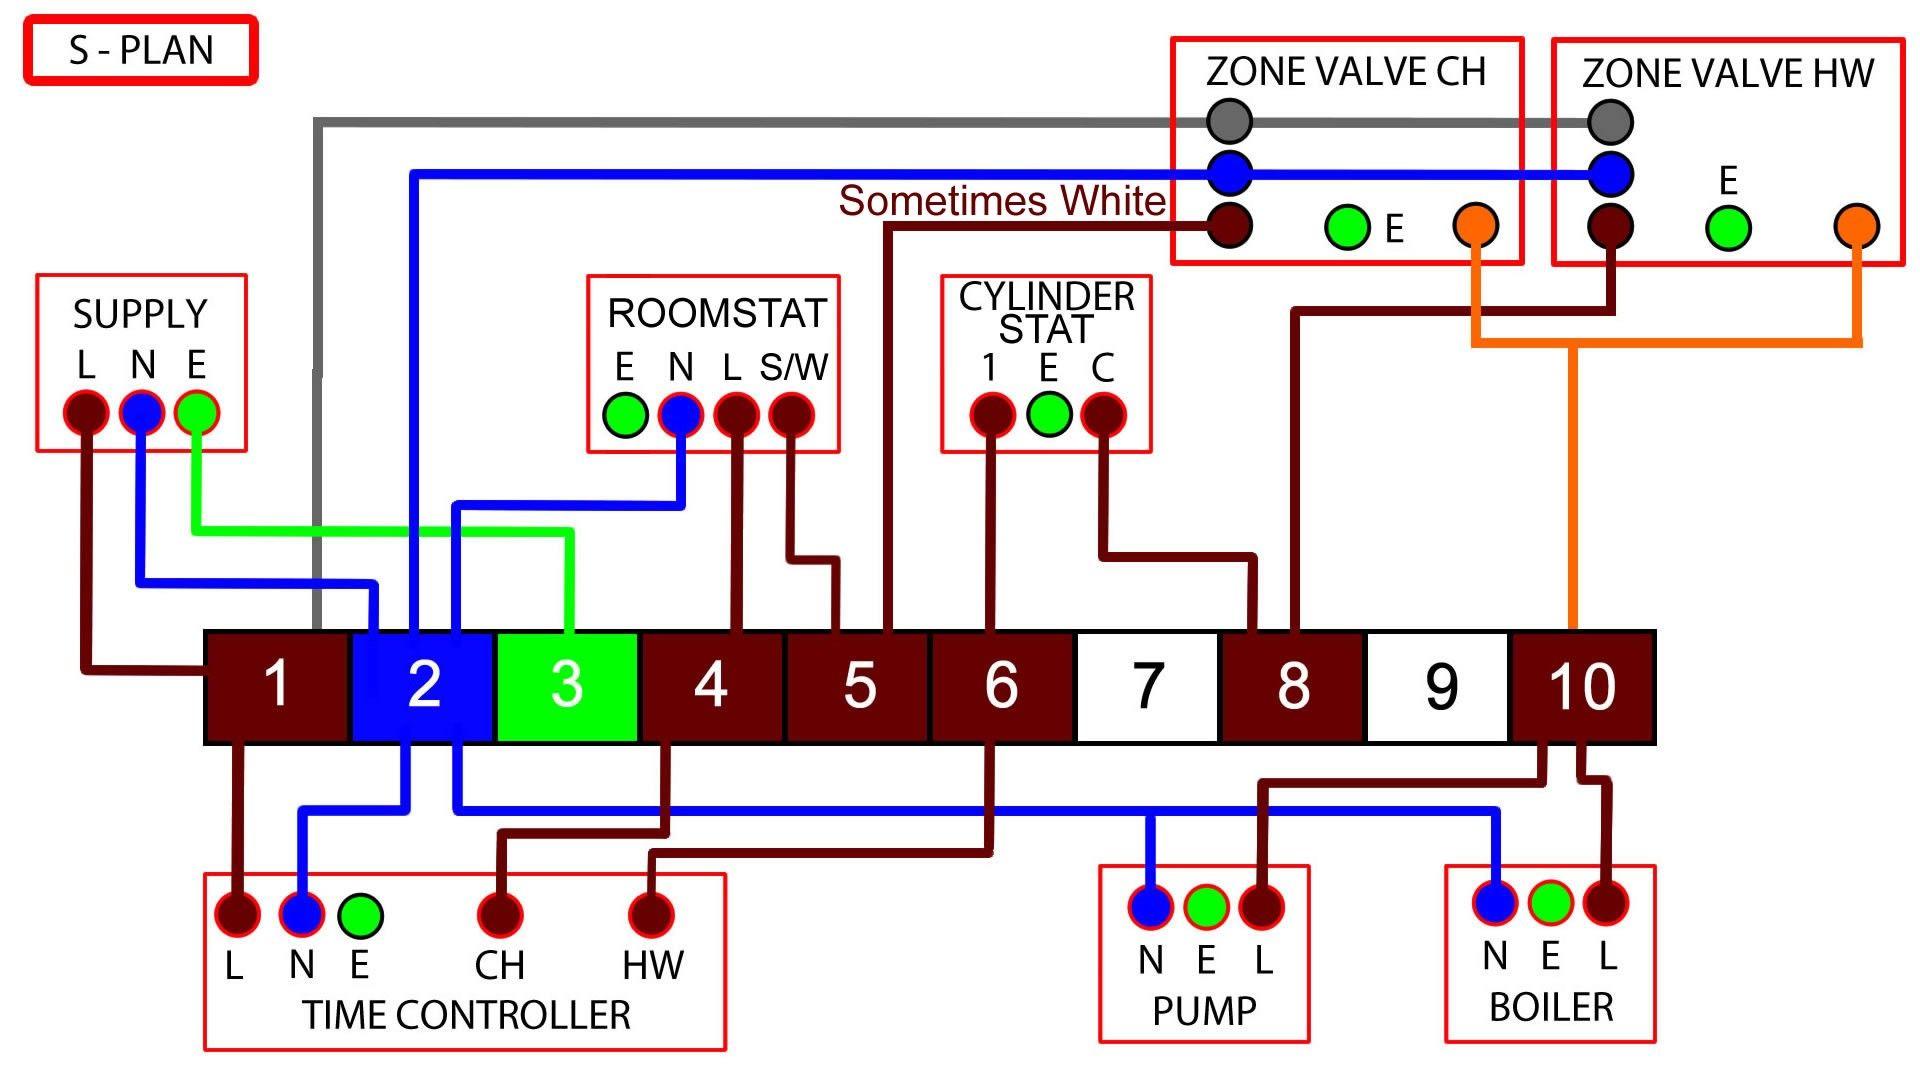 Fresh Megaflo Wiring Diagram Y Plan Diagrams Digramssample Diagramimages Wiringdiagramsample Wiringdiagram Heating Systems Central Heating How To Plan